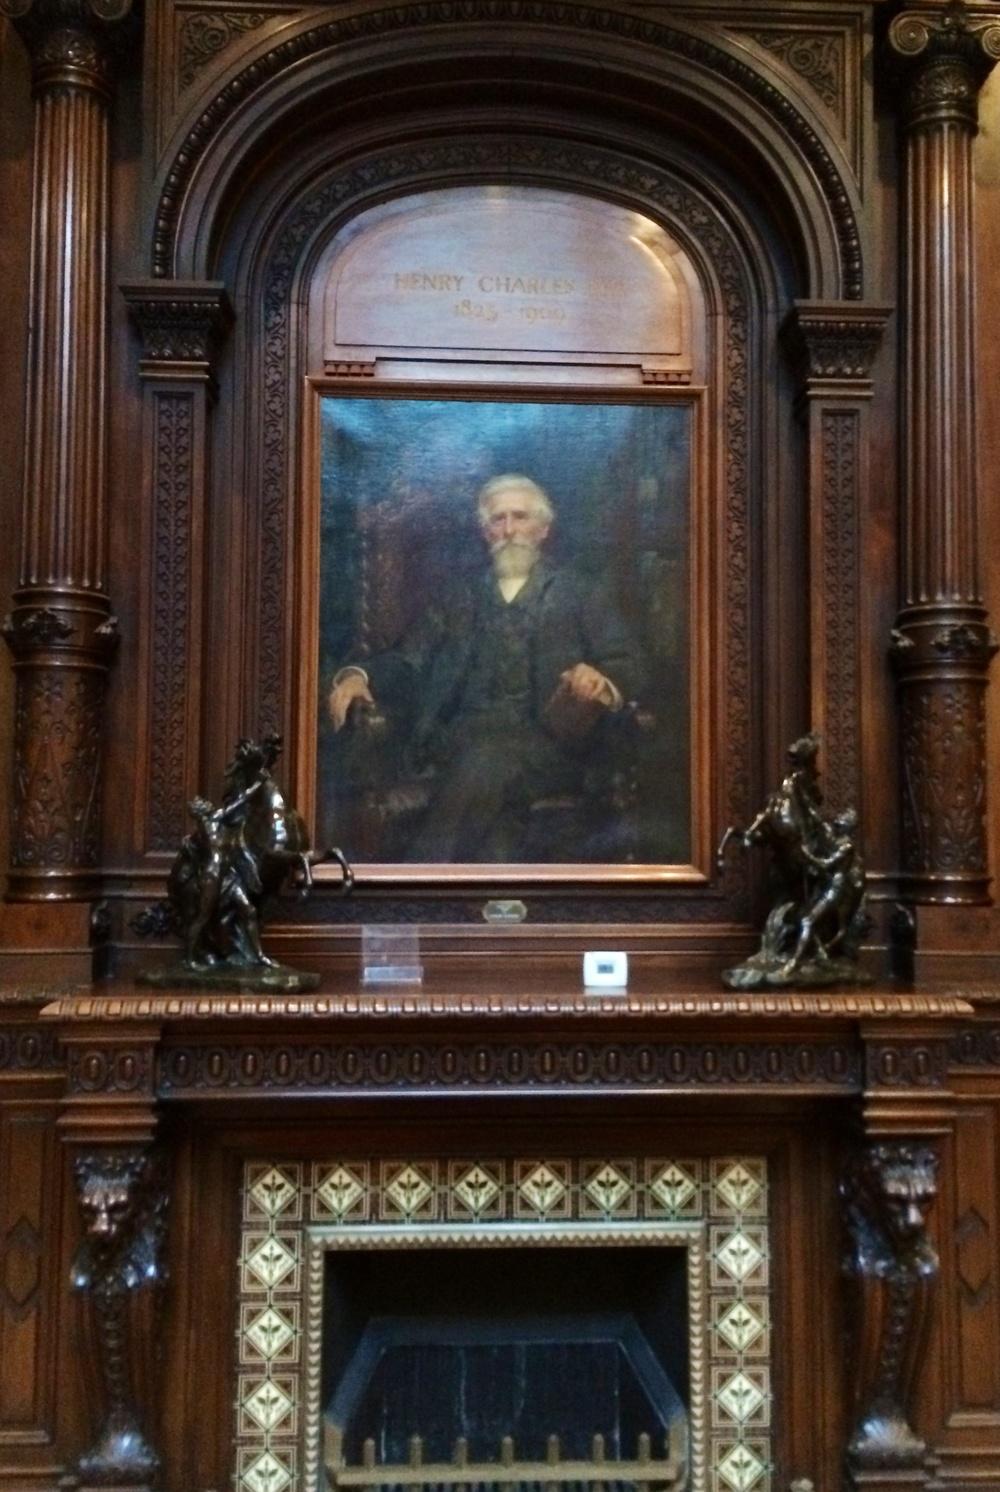 The Henry Charles Lea Libray, uPenn (PA, USA)